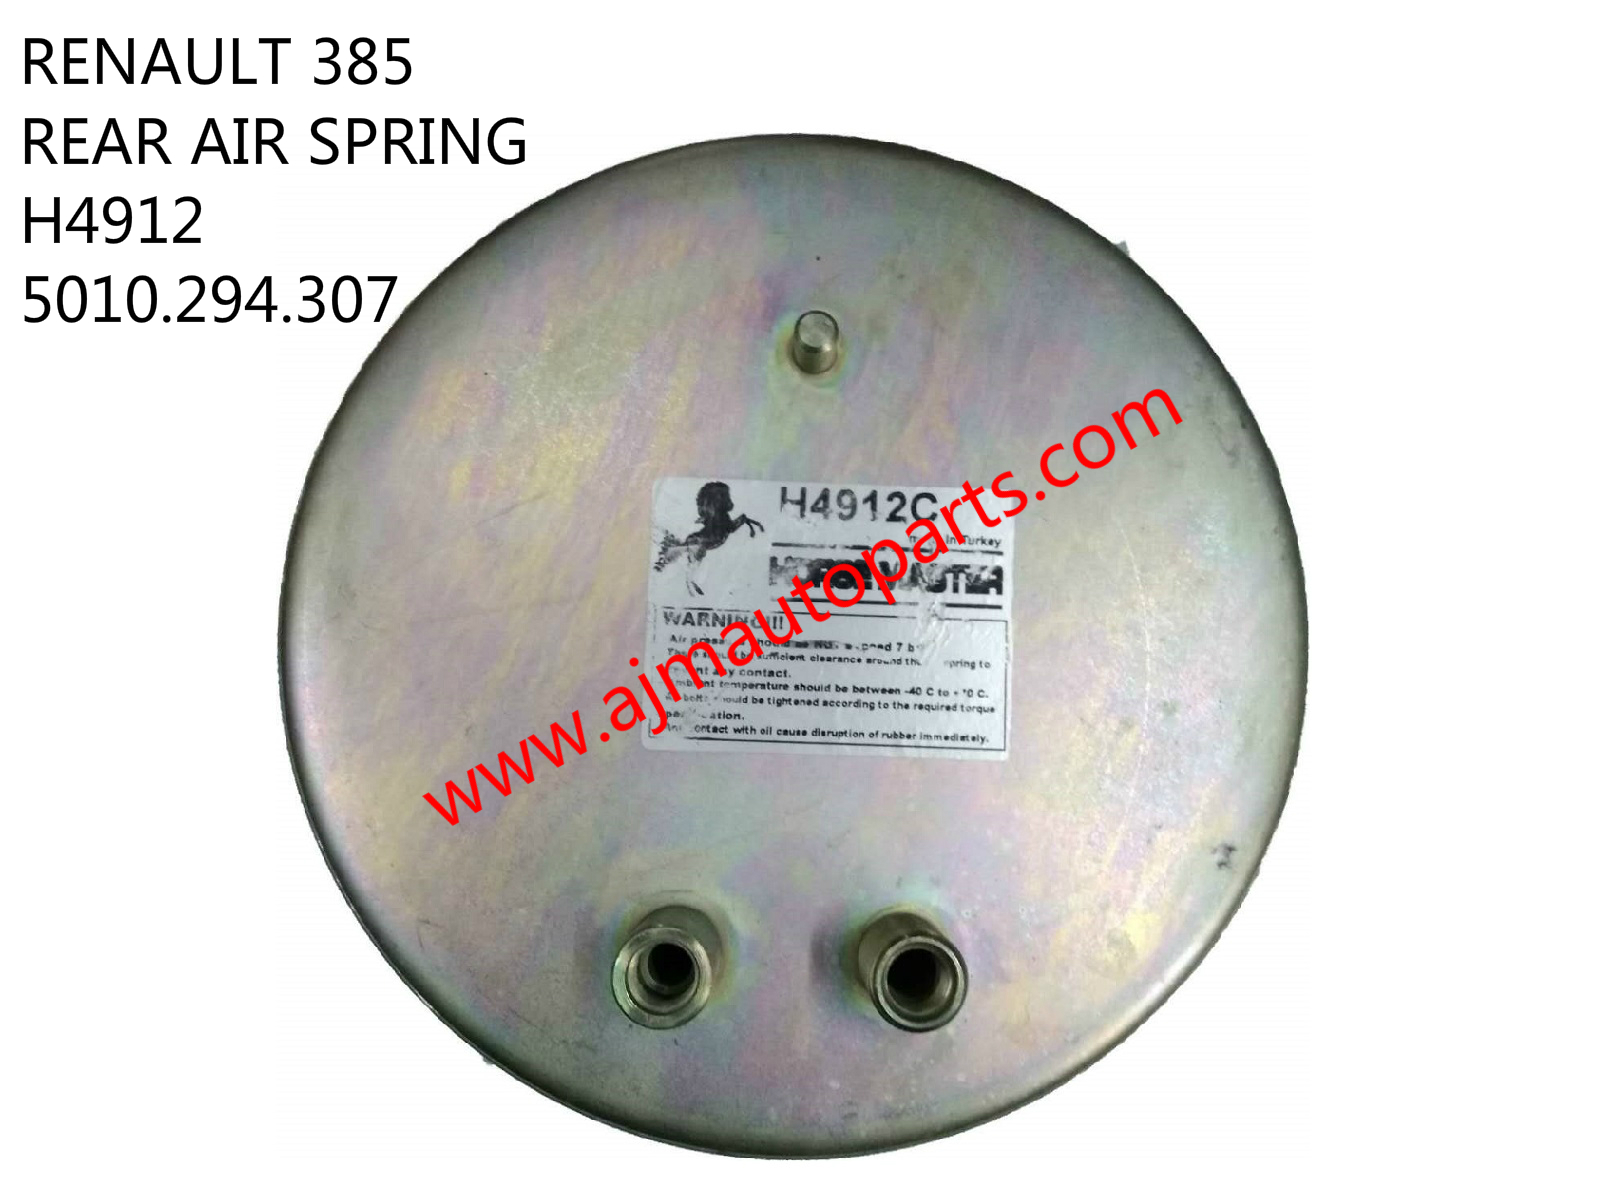 RENAULT REAR AIR SPRING-H4912 5010.294.307